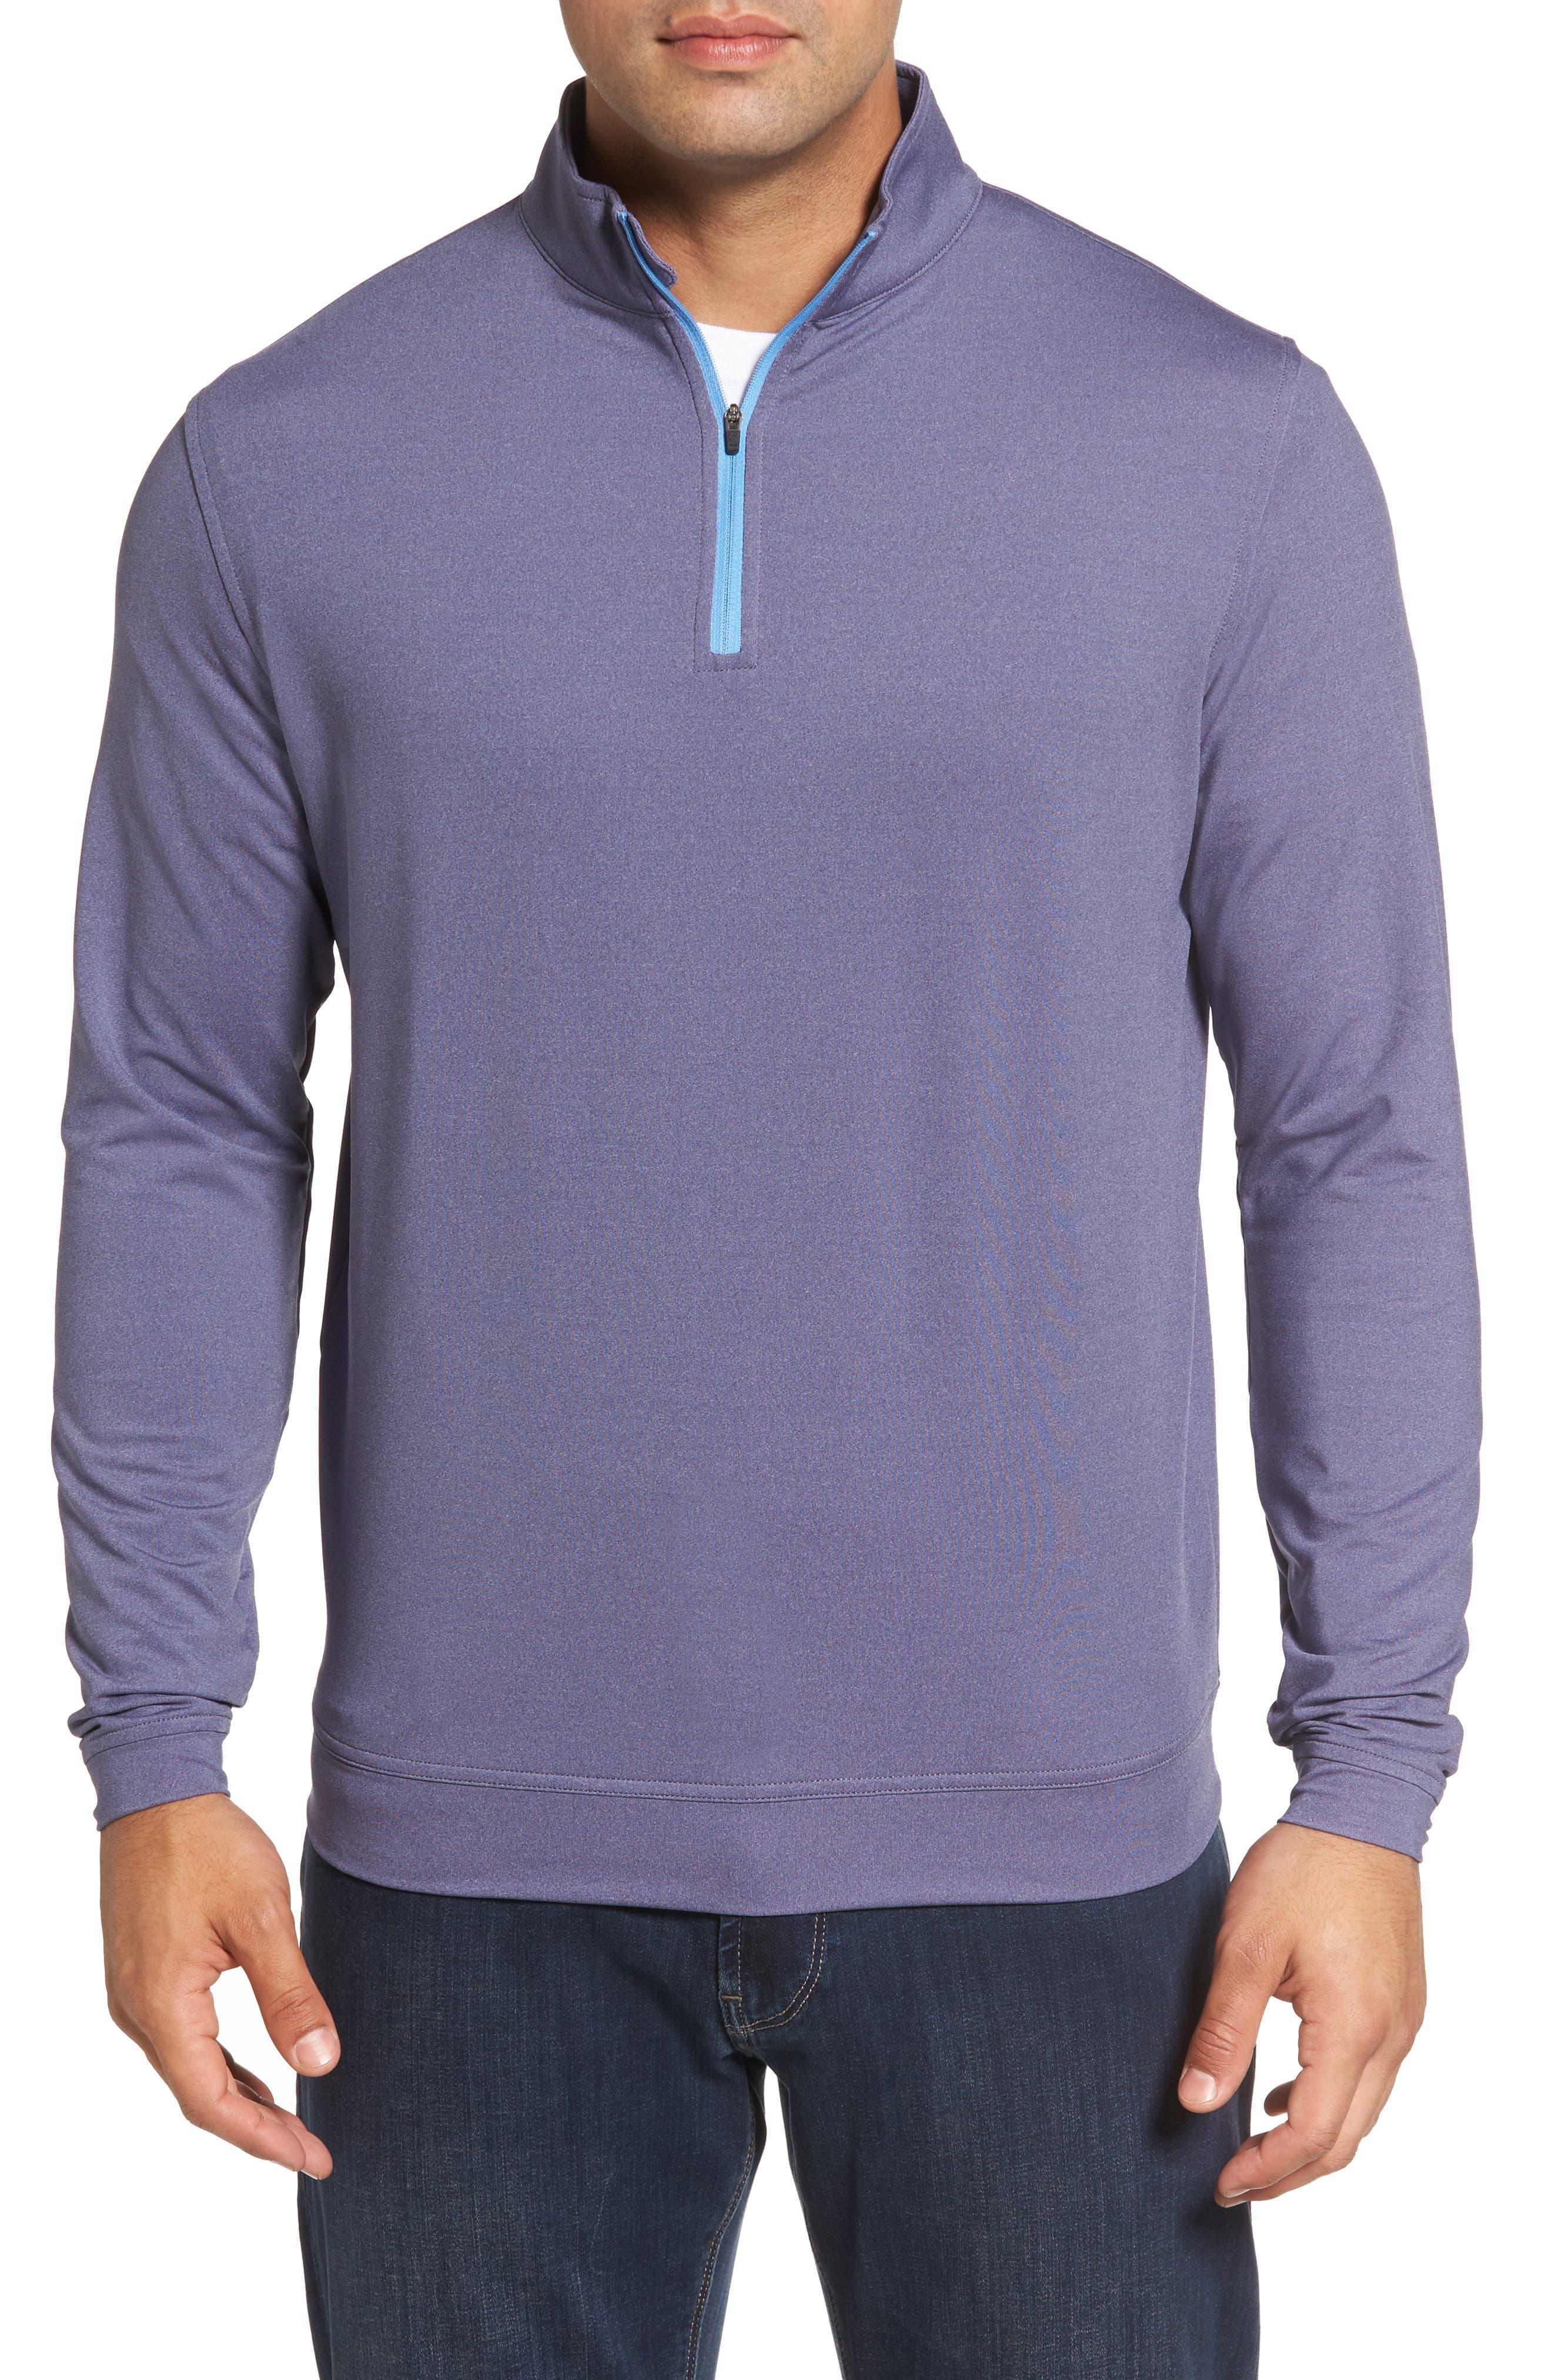 Perth Quarter Zip Stretch Pullover,                             Main thumbnail 1, color,                             Blackberry